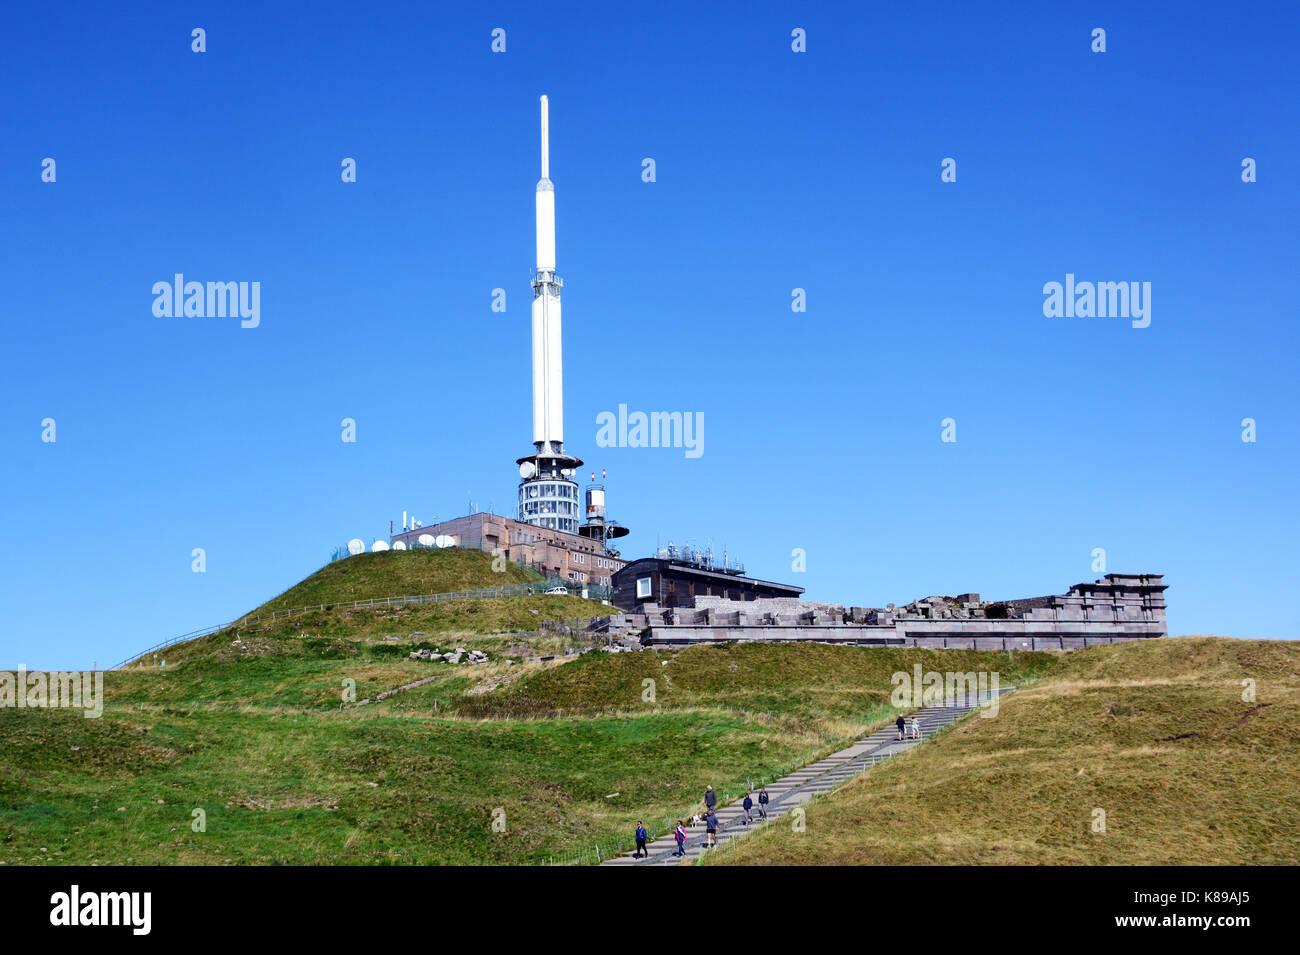 TV Antenne und Mercure Tempel, Puy-de-Dome Peak, Auvergne, Zentralmassiv, Frankreich Stockbild